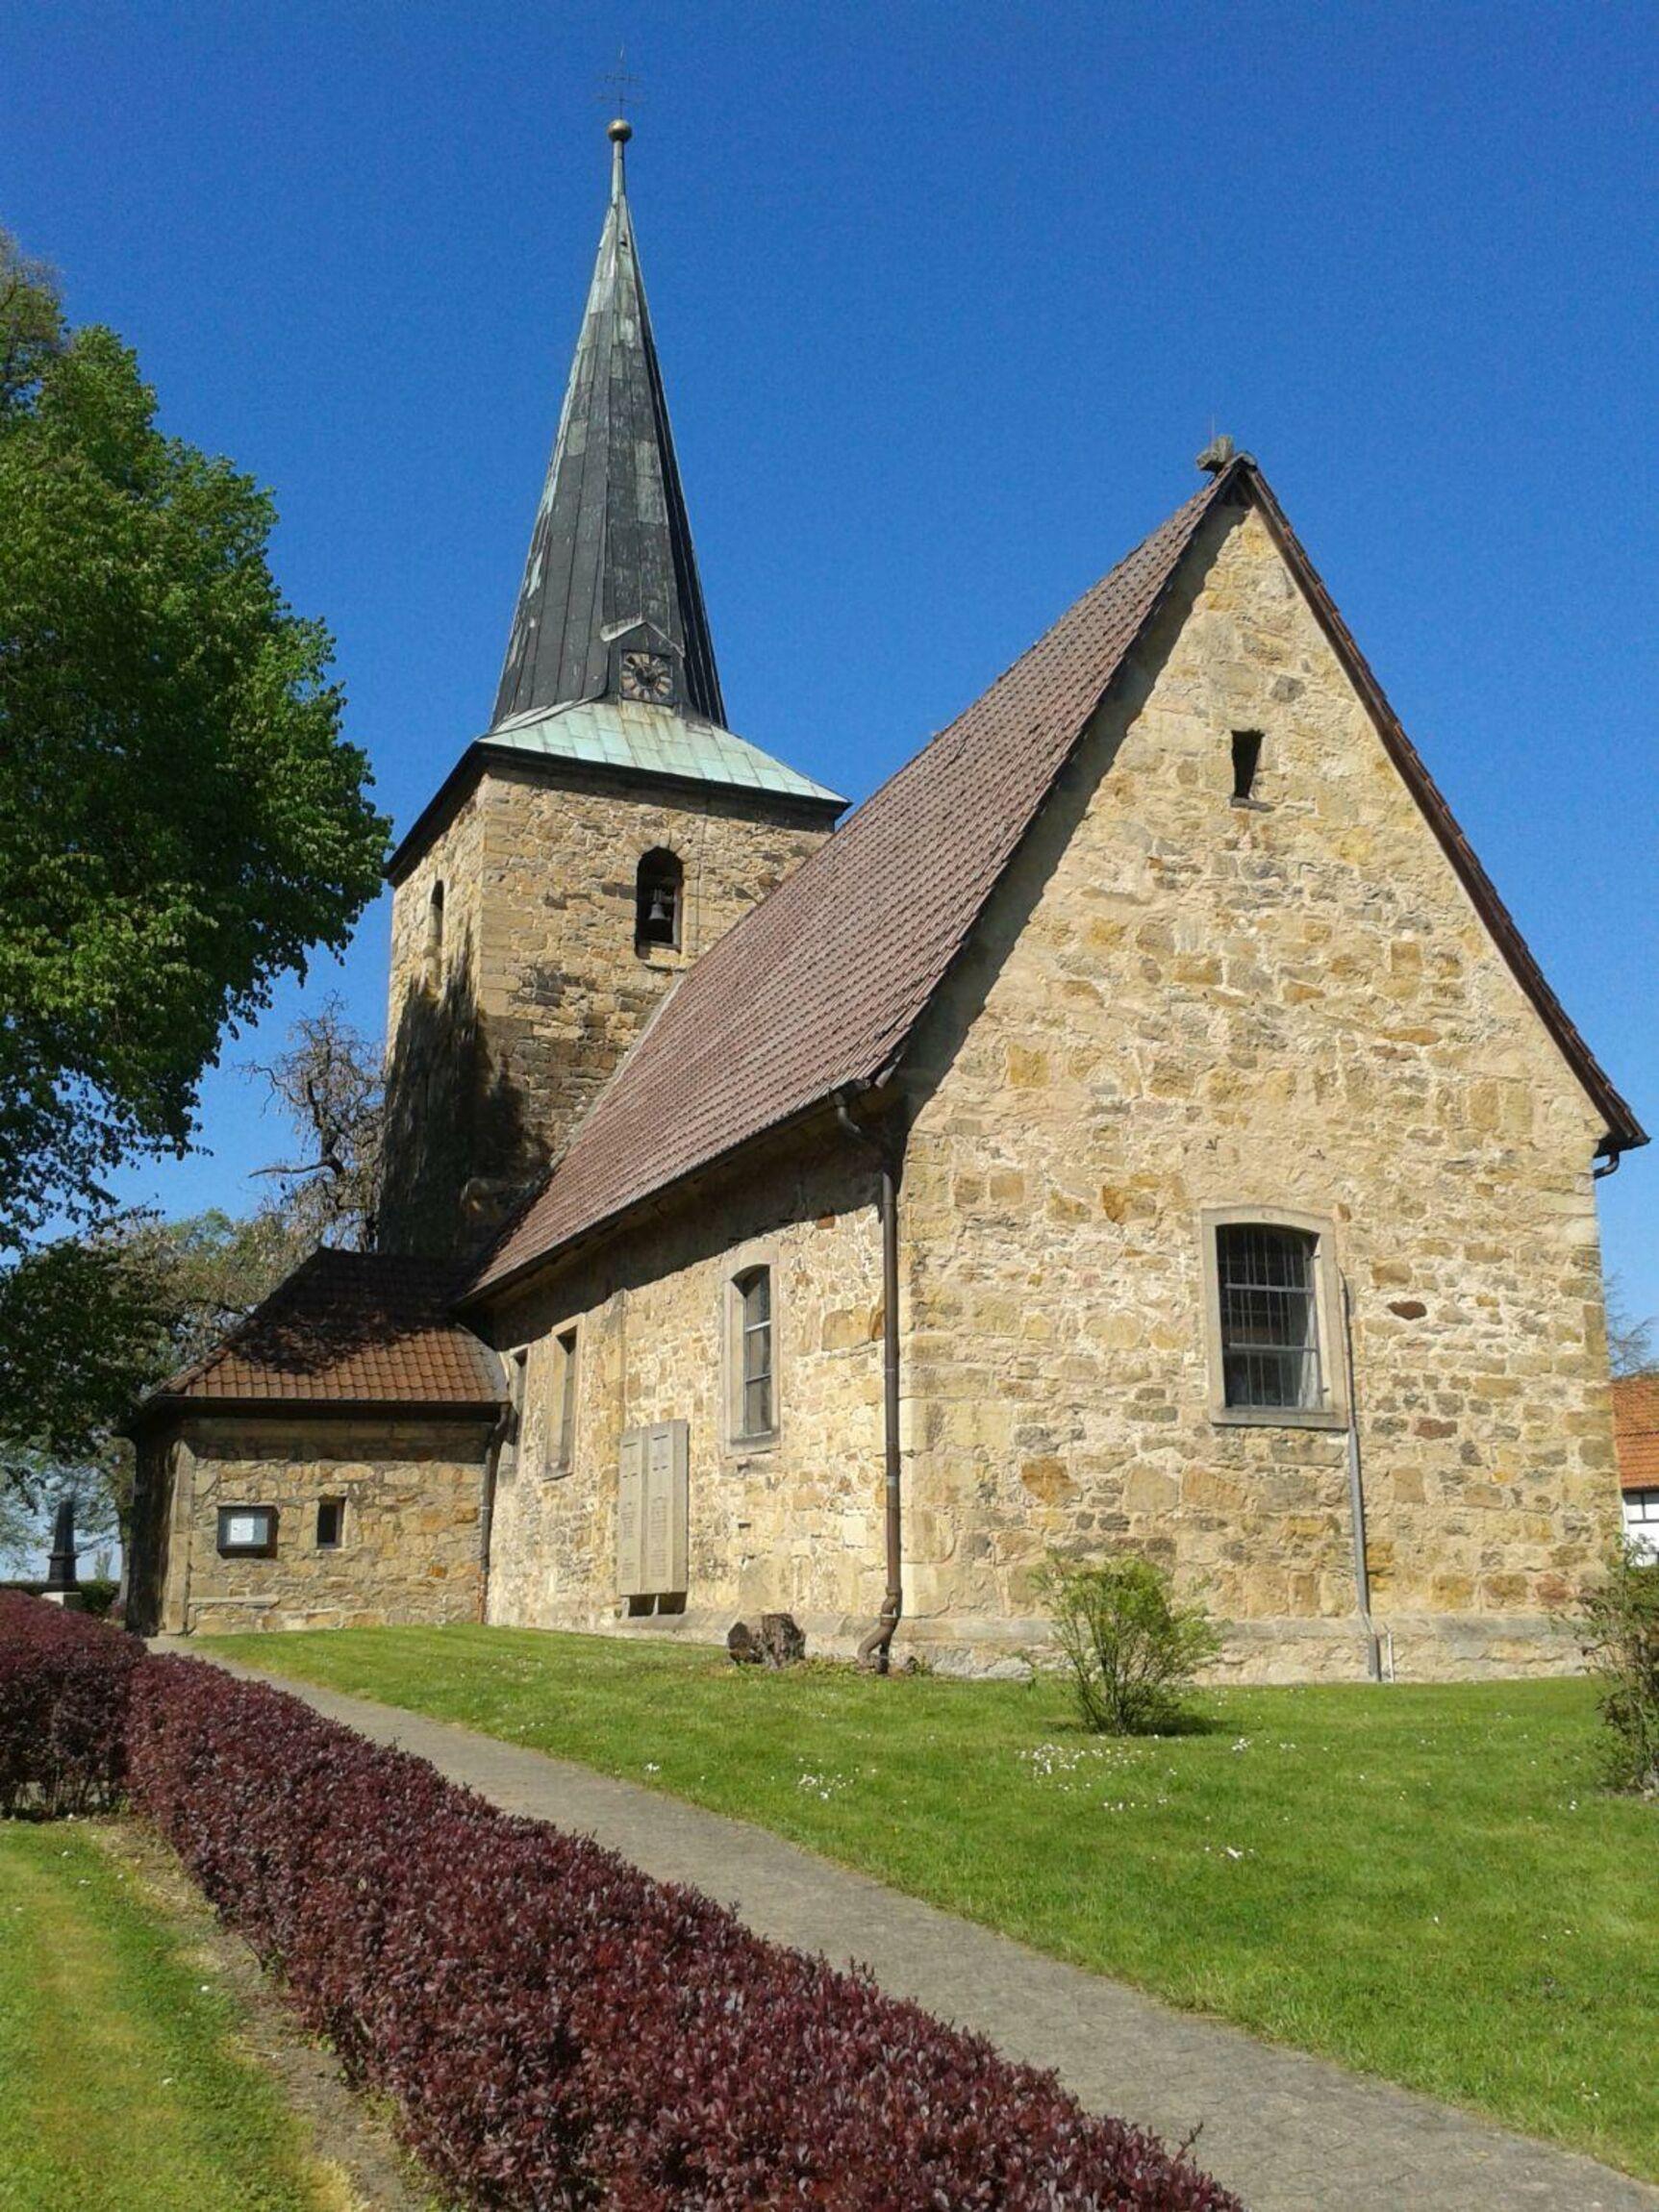 Ev.-luth. St. Cosmas- und Damian Kirche Rautenberg